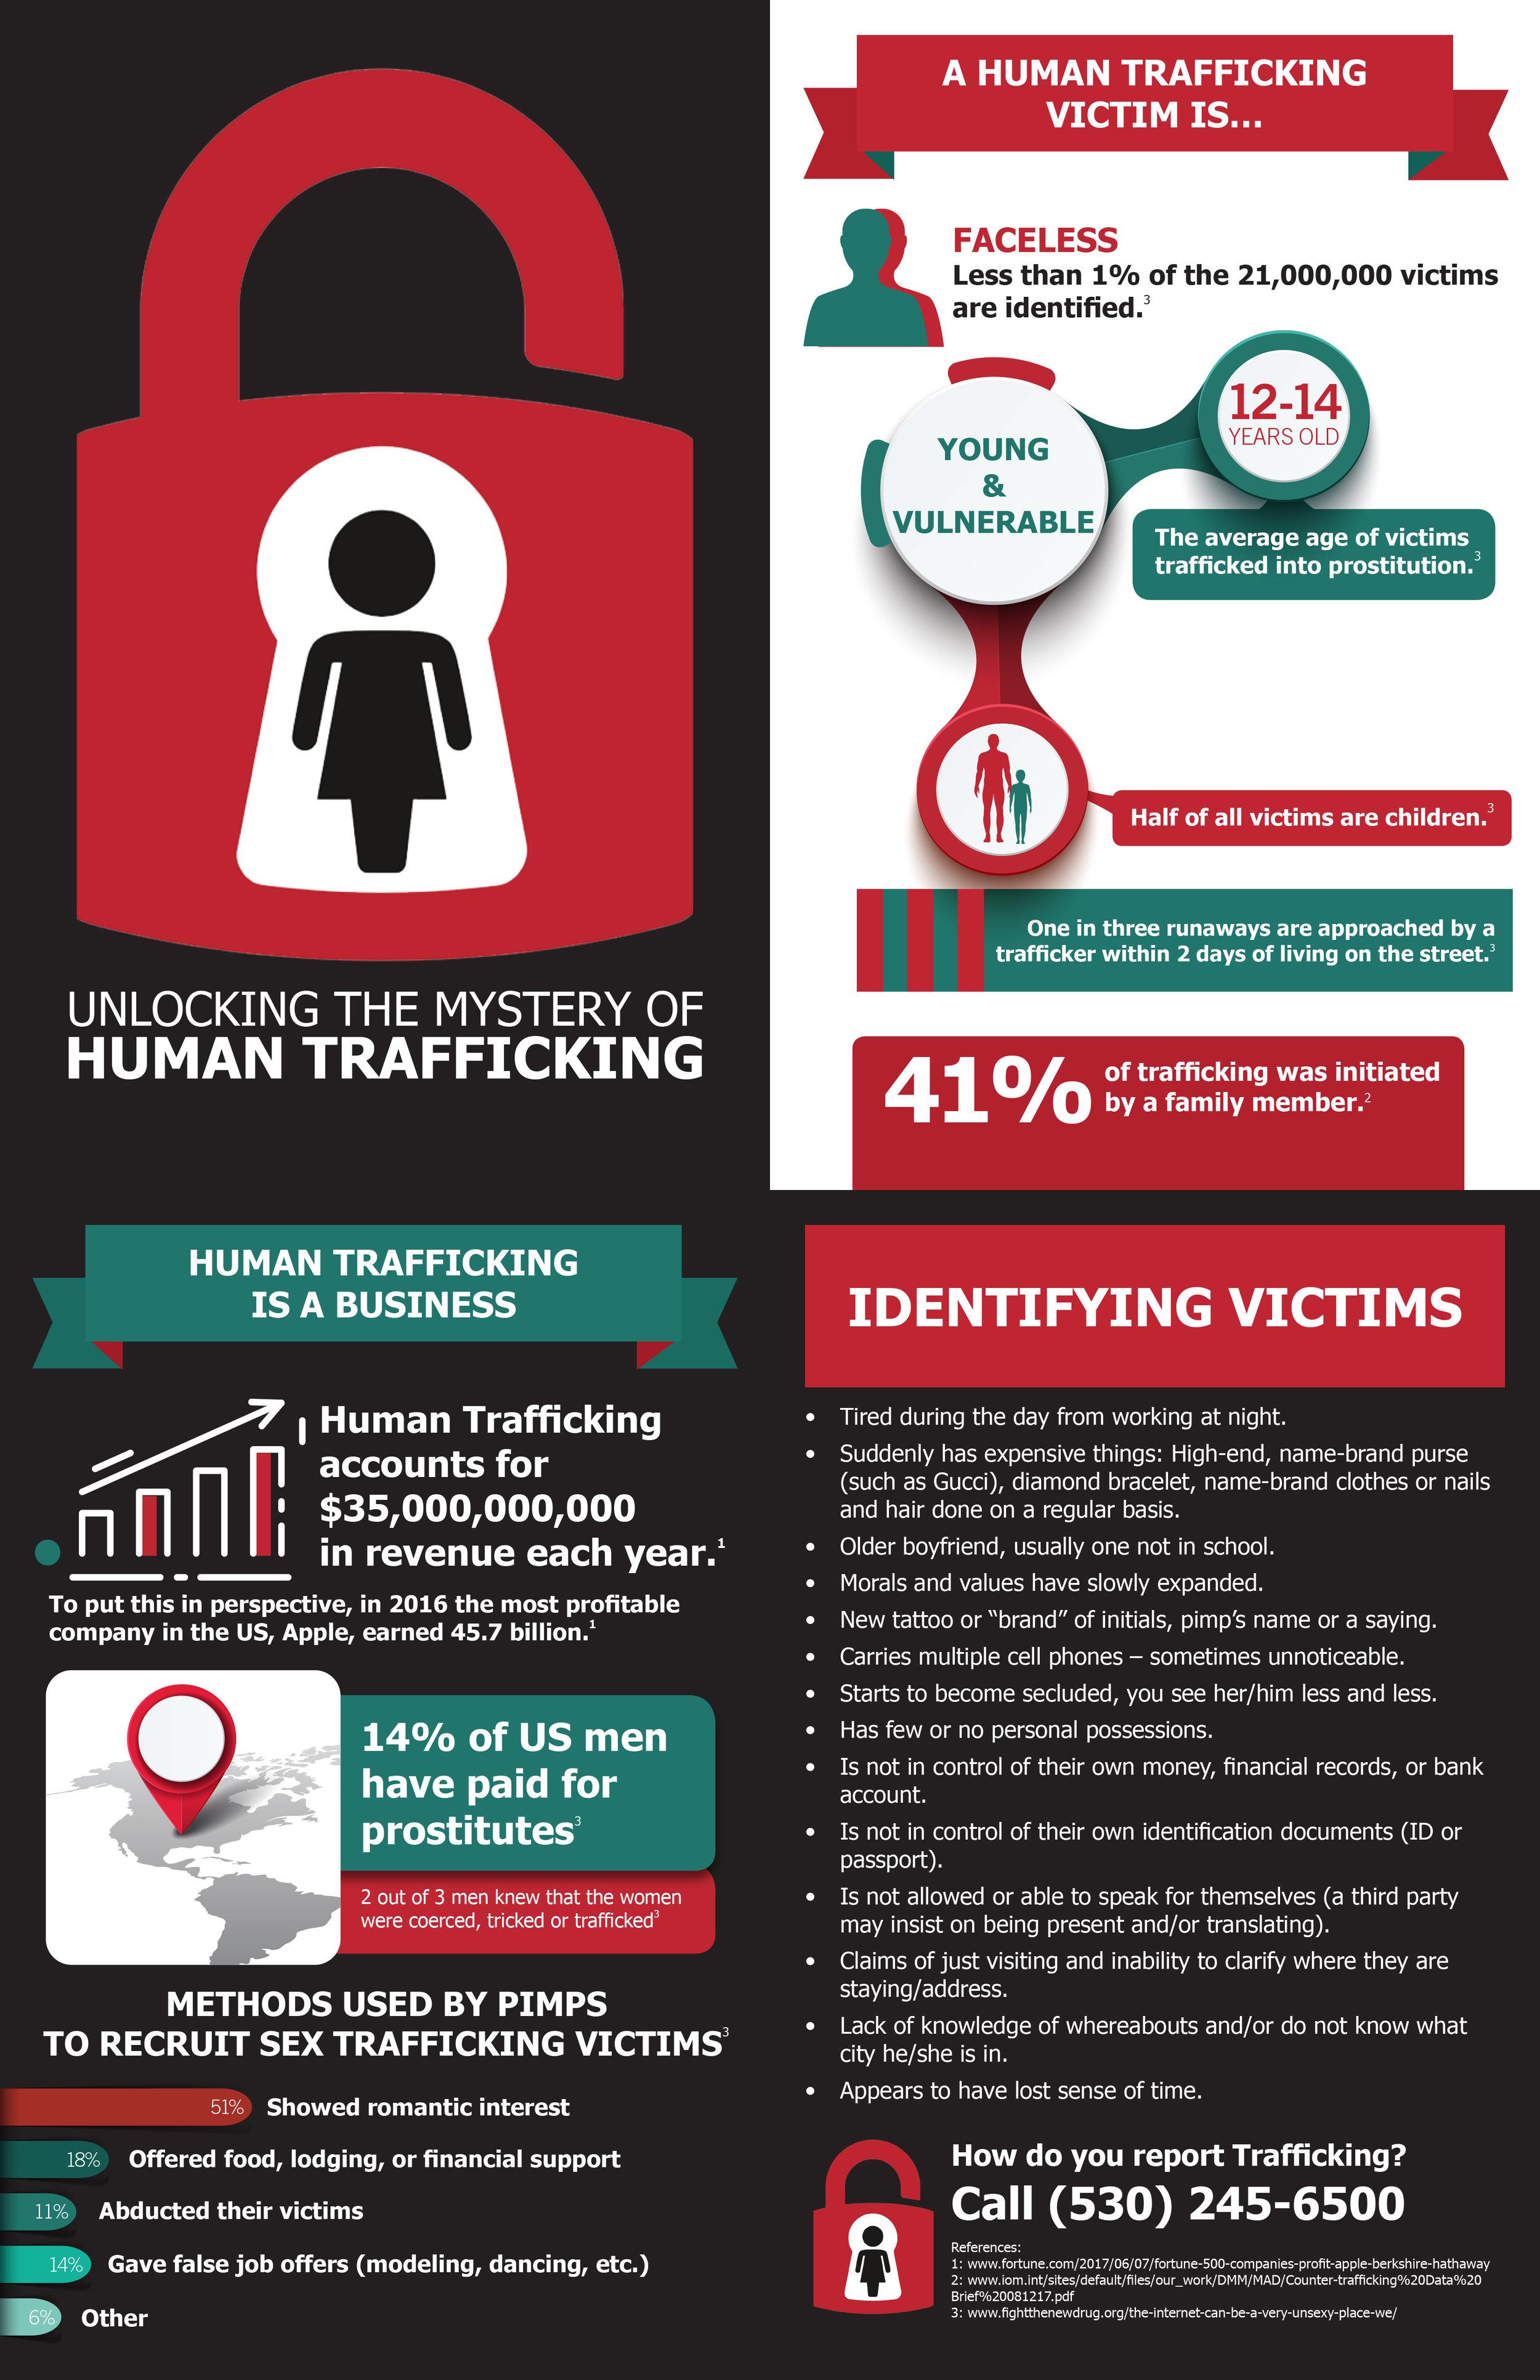 Human Trafficking Brochure - Northern California Anti-Trafficking Coalition Ambassador Packet